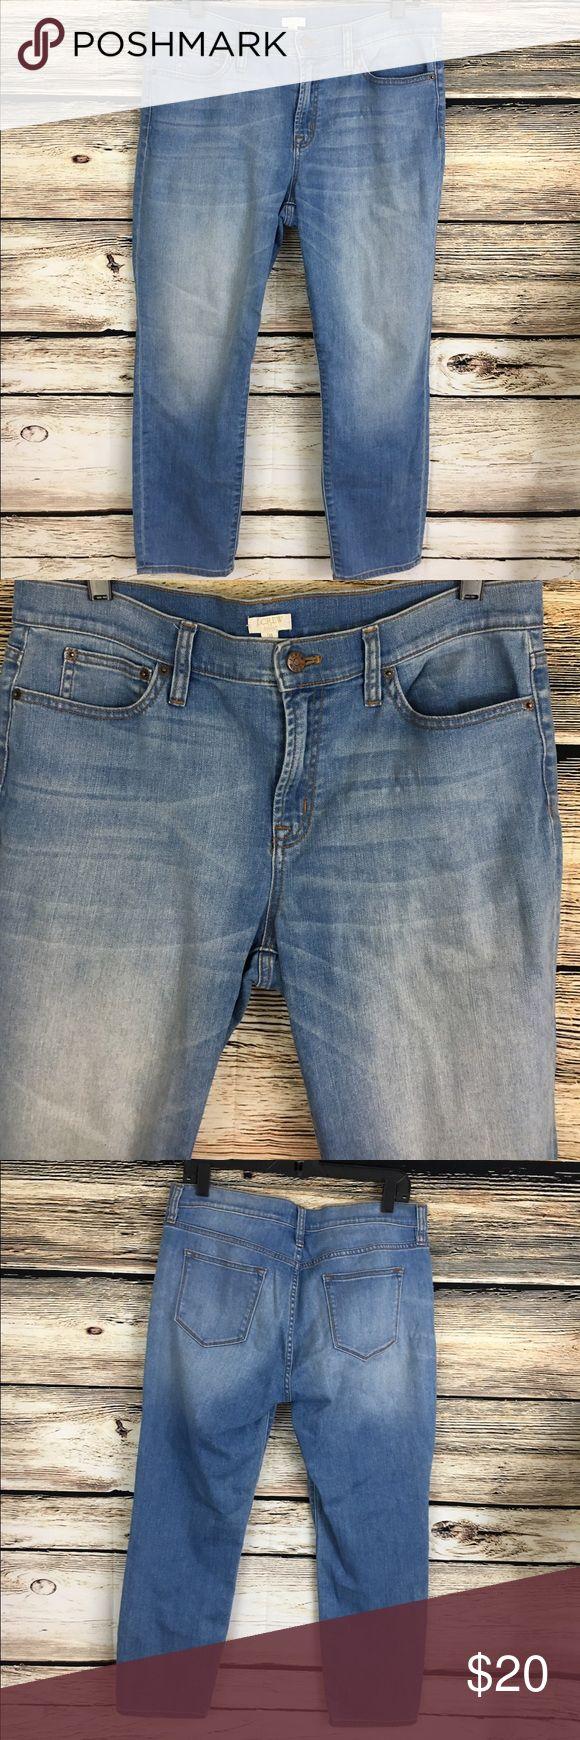 "J.Crew women's cropped denim capri blue wash 34x25 J.Crew women's cropped capris, Tag reads 31 stretch, waist measures 34"" Inseam 25"" Cotton blend, comfortable stretch in medium blue wash, excellent condition! J. Crew Jeans Ankle & Cropped"